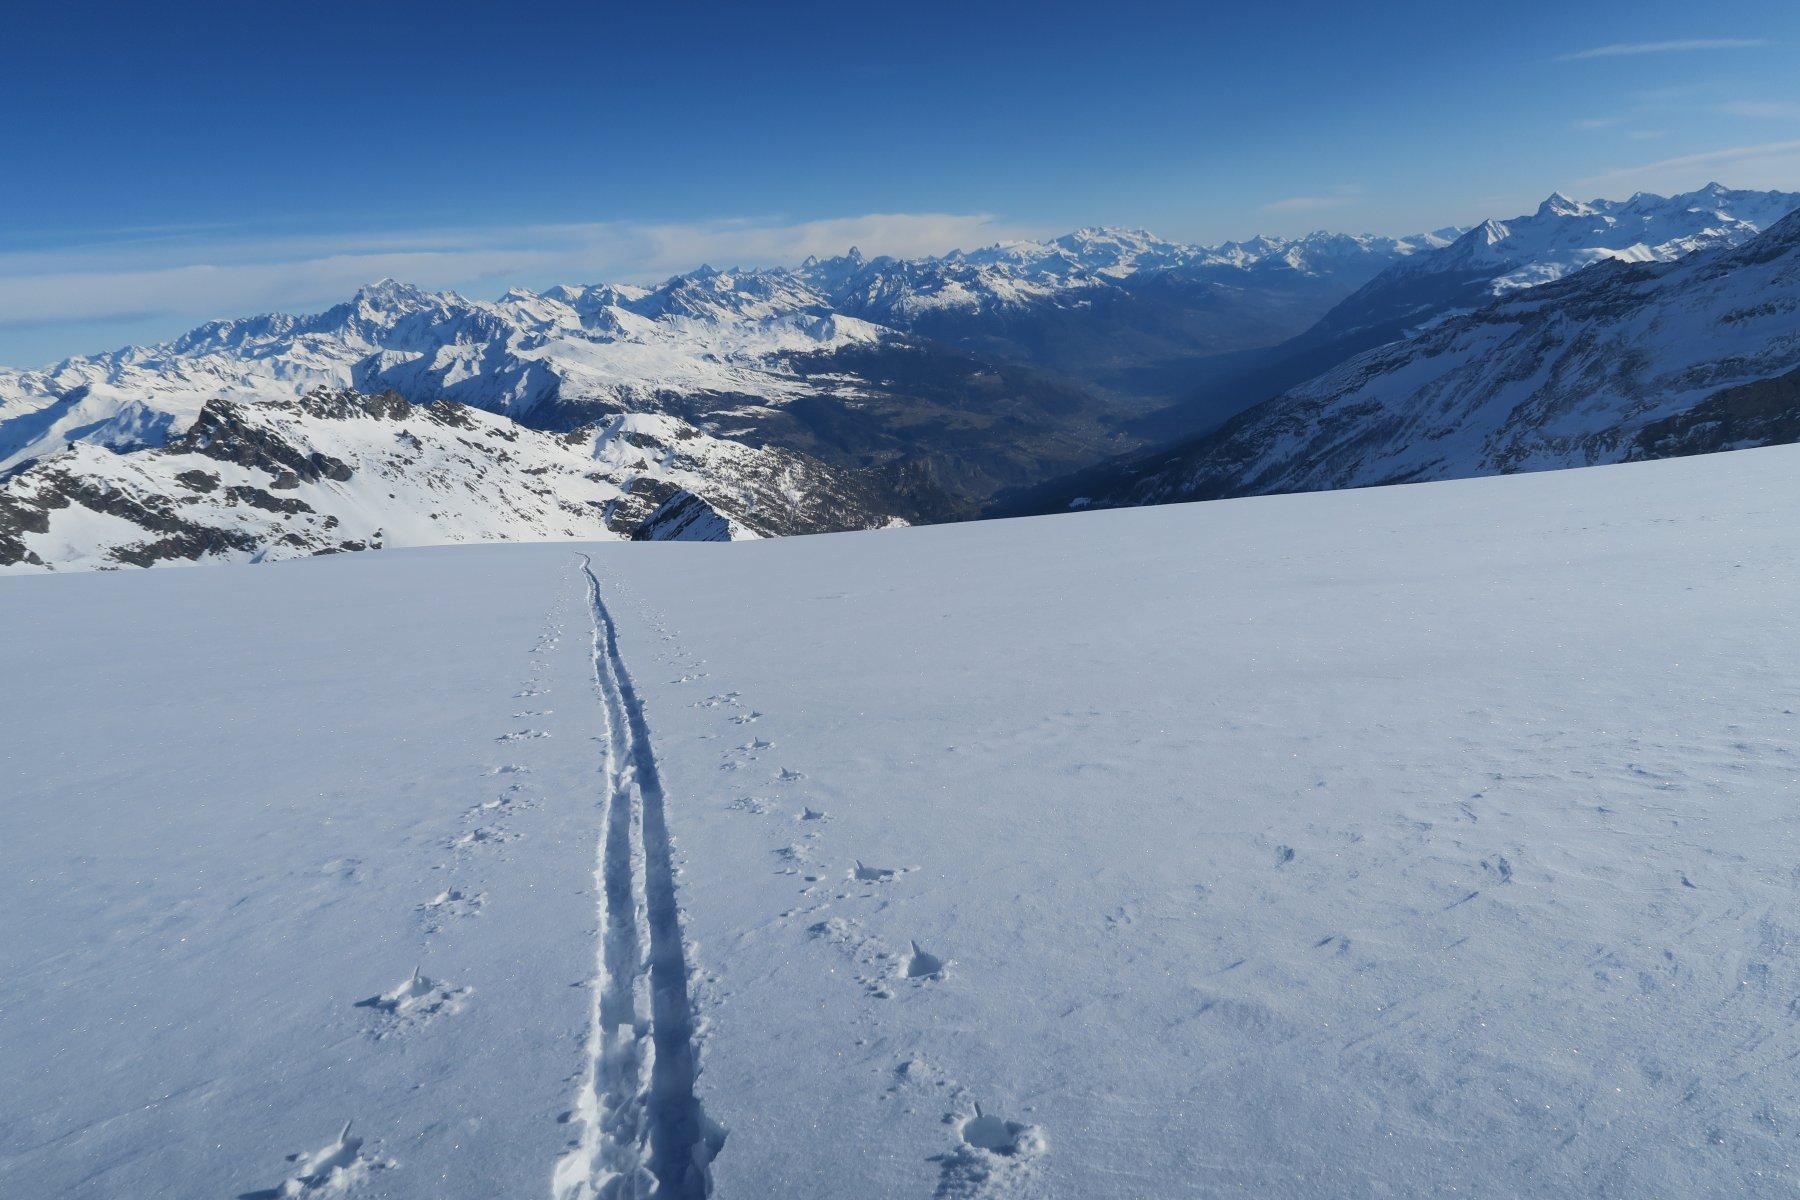 bella neve sul ghiacciaio